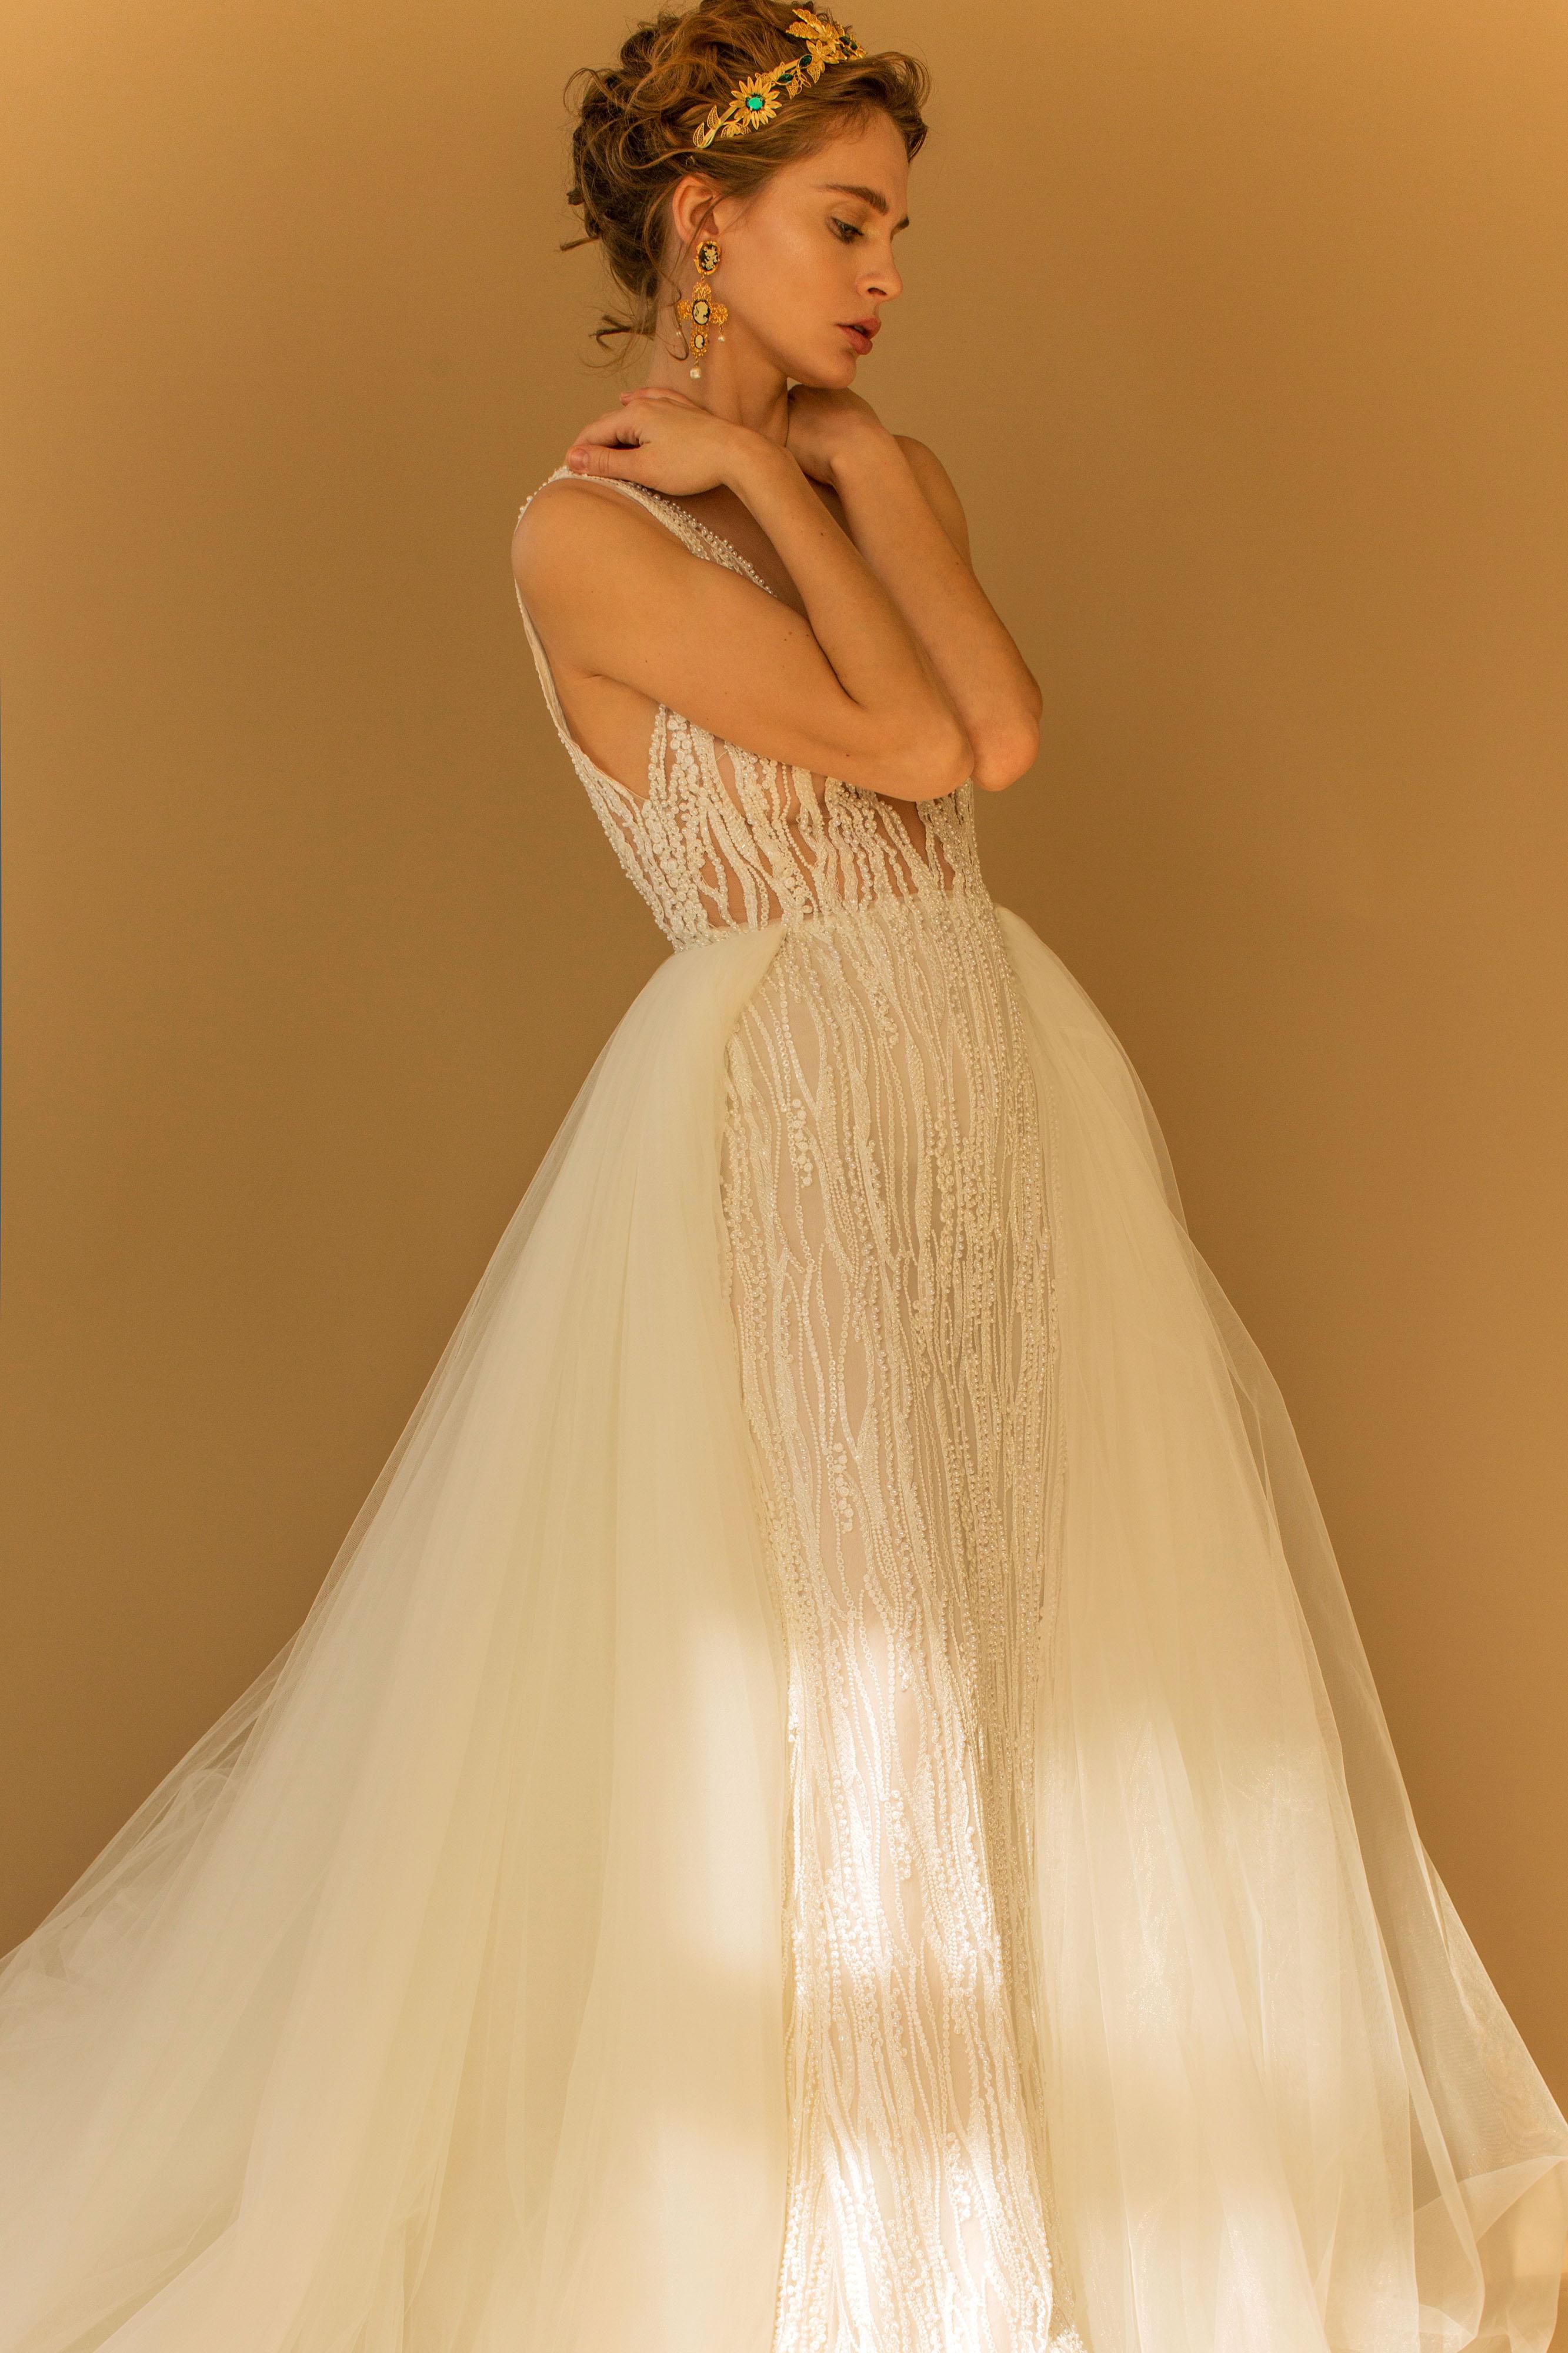 francesca miranda wedding dress fall 2018 tulle sleeveless embellished